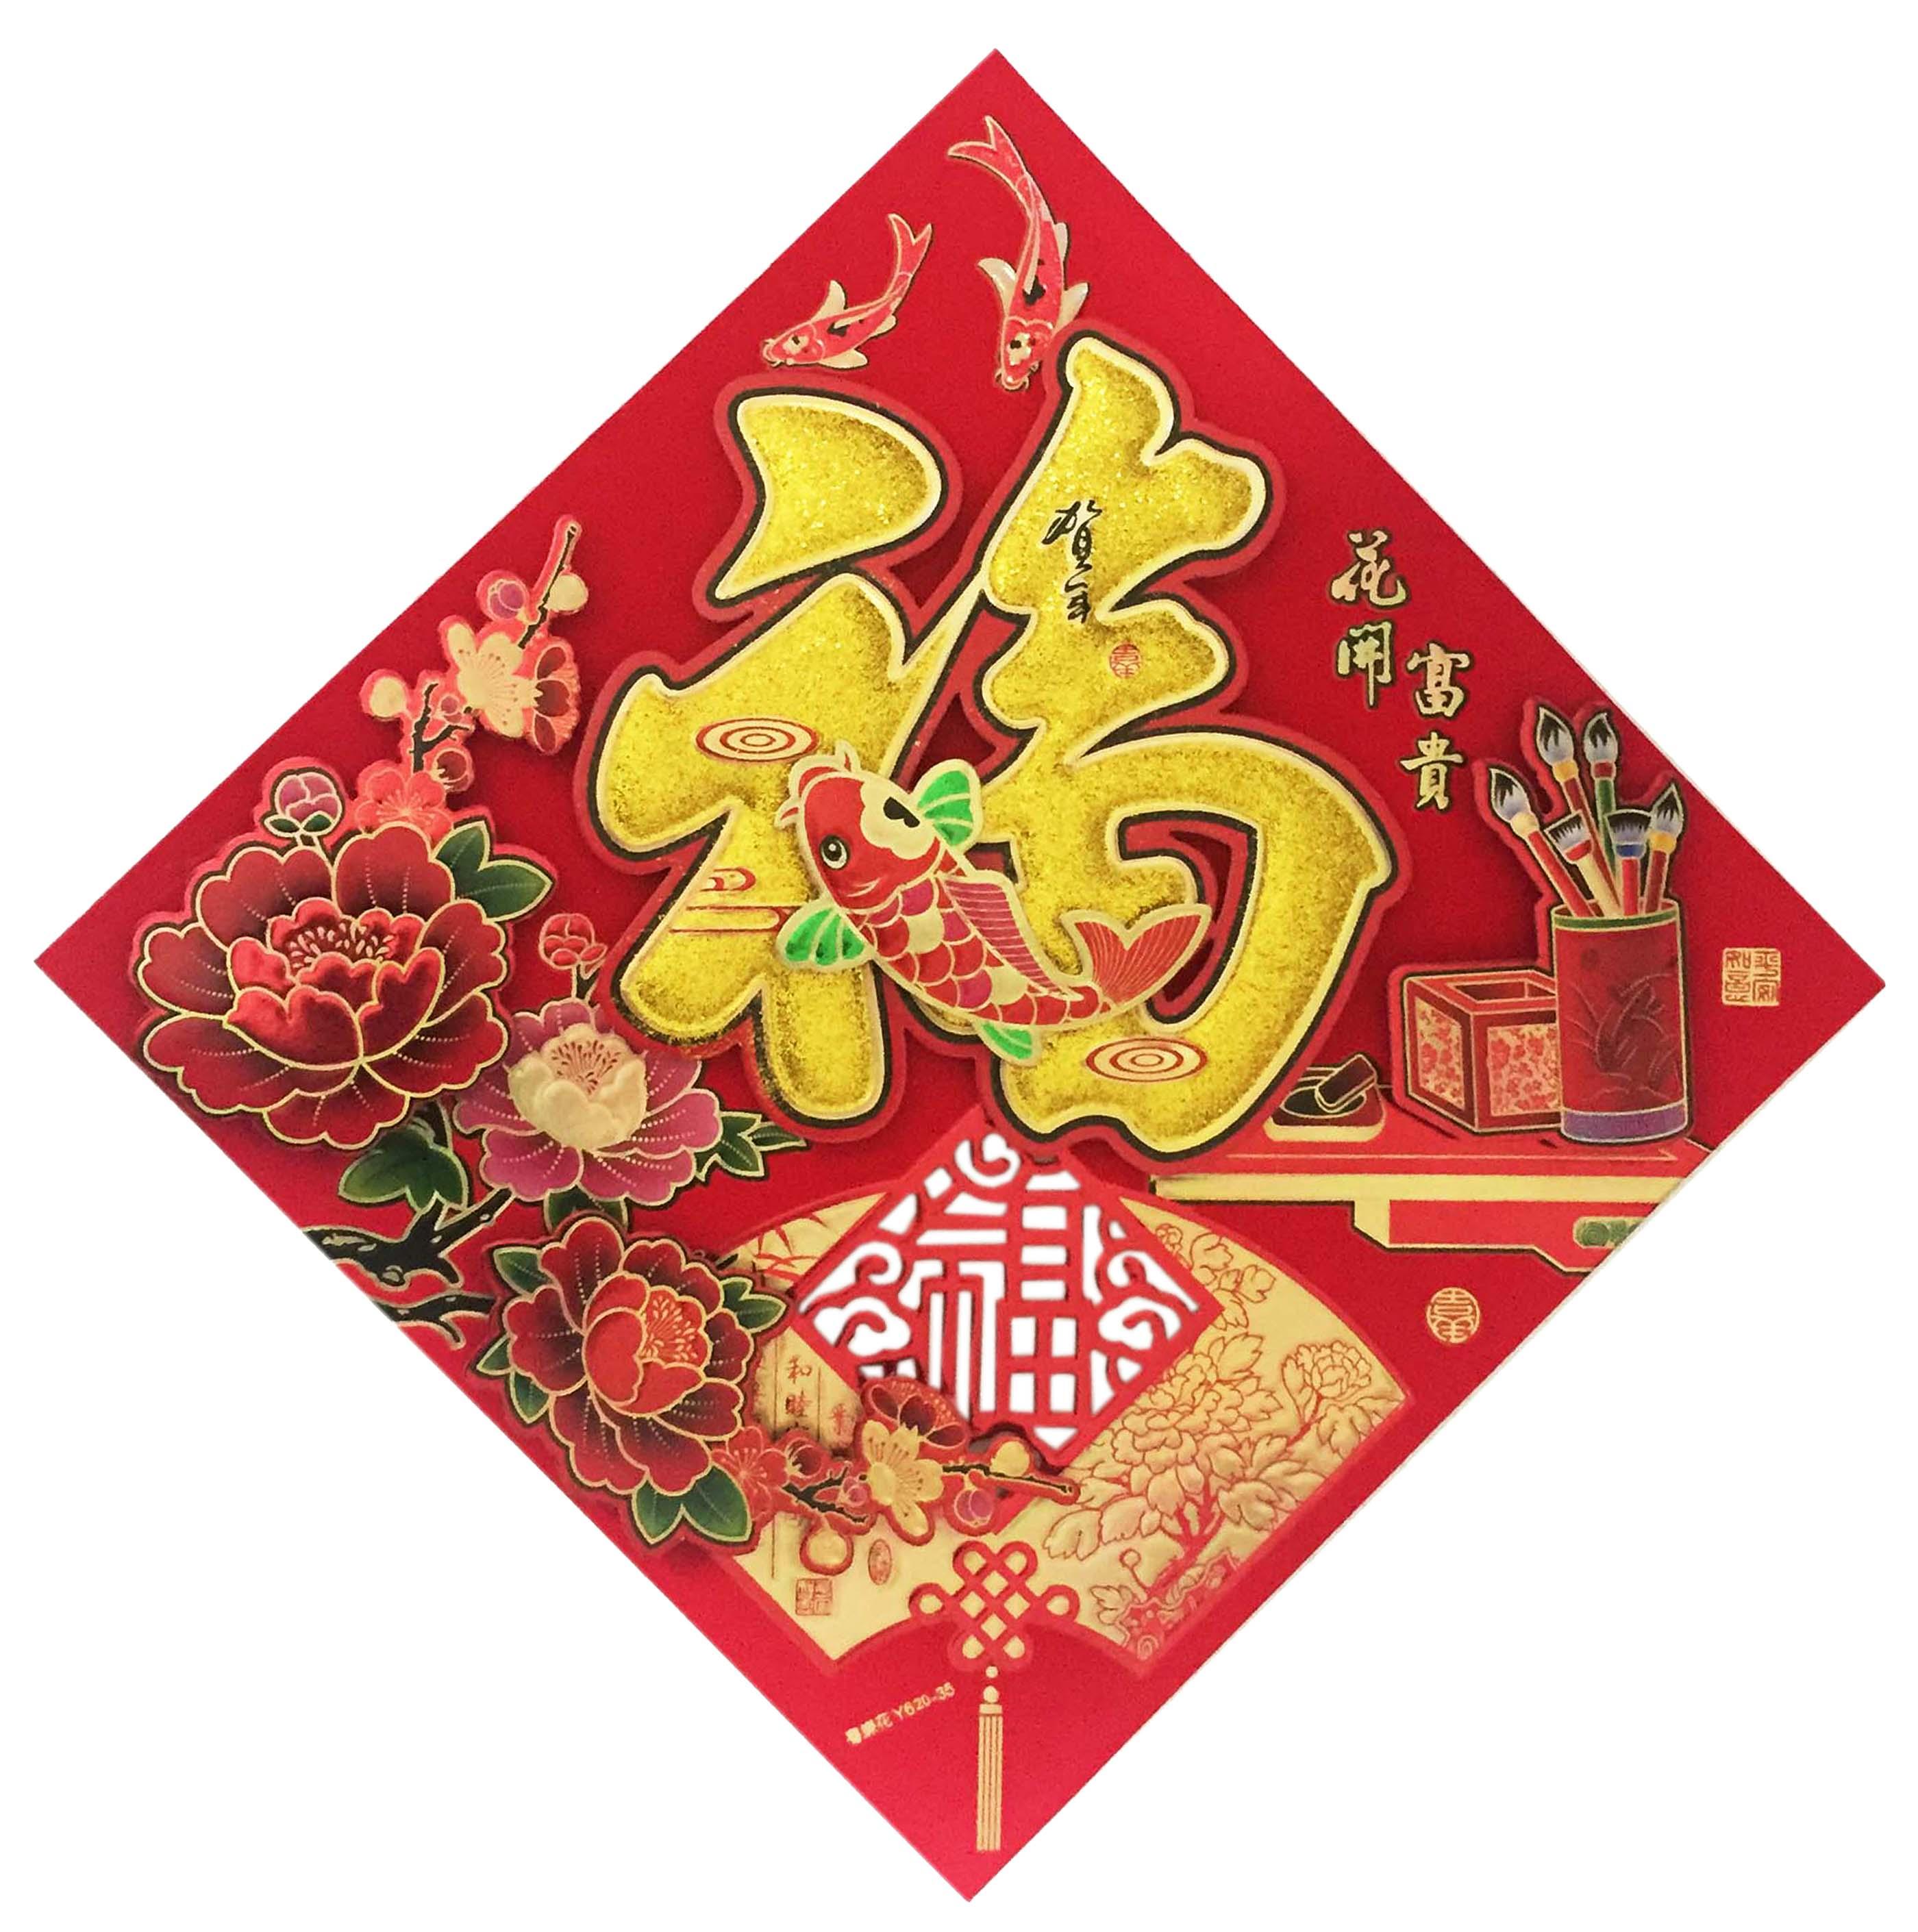 X射線【Z715983】富貴福斗方,雞年春節/過年佈置/門聯/春聯/紙製品/賀年/壁貼/門神